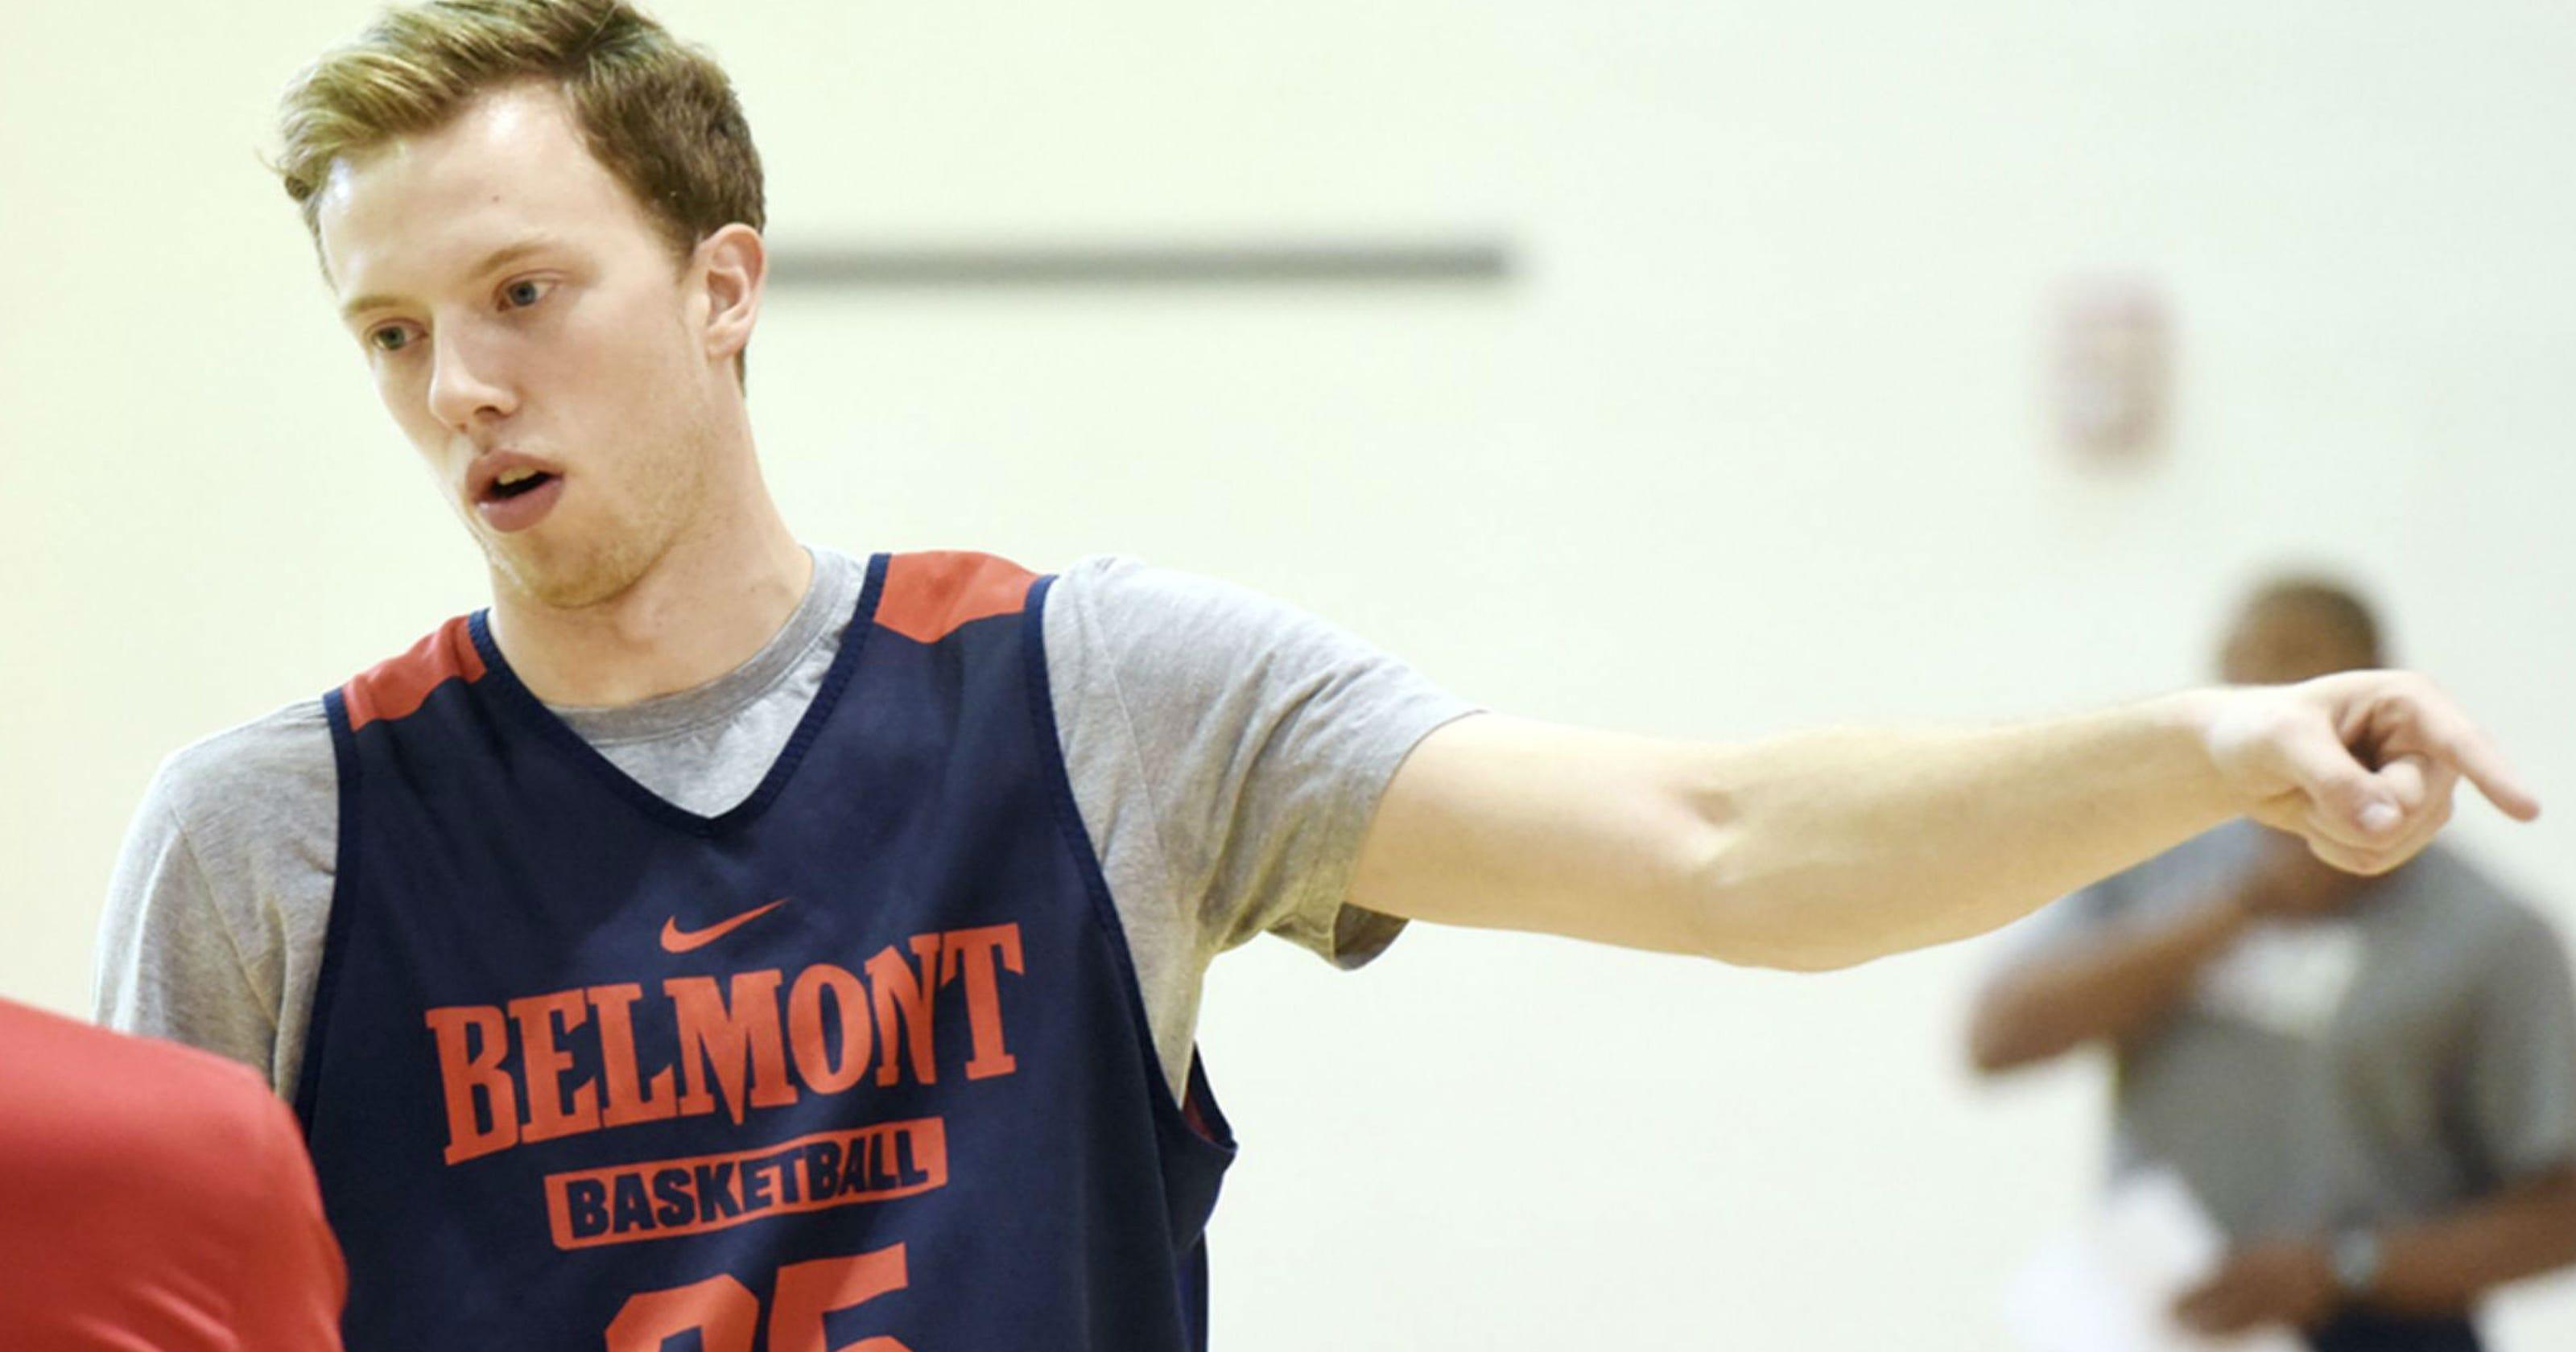 Boston Celtics: Belmont star Evan Bradds added as NBA